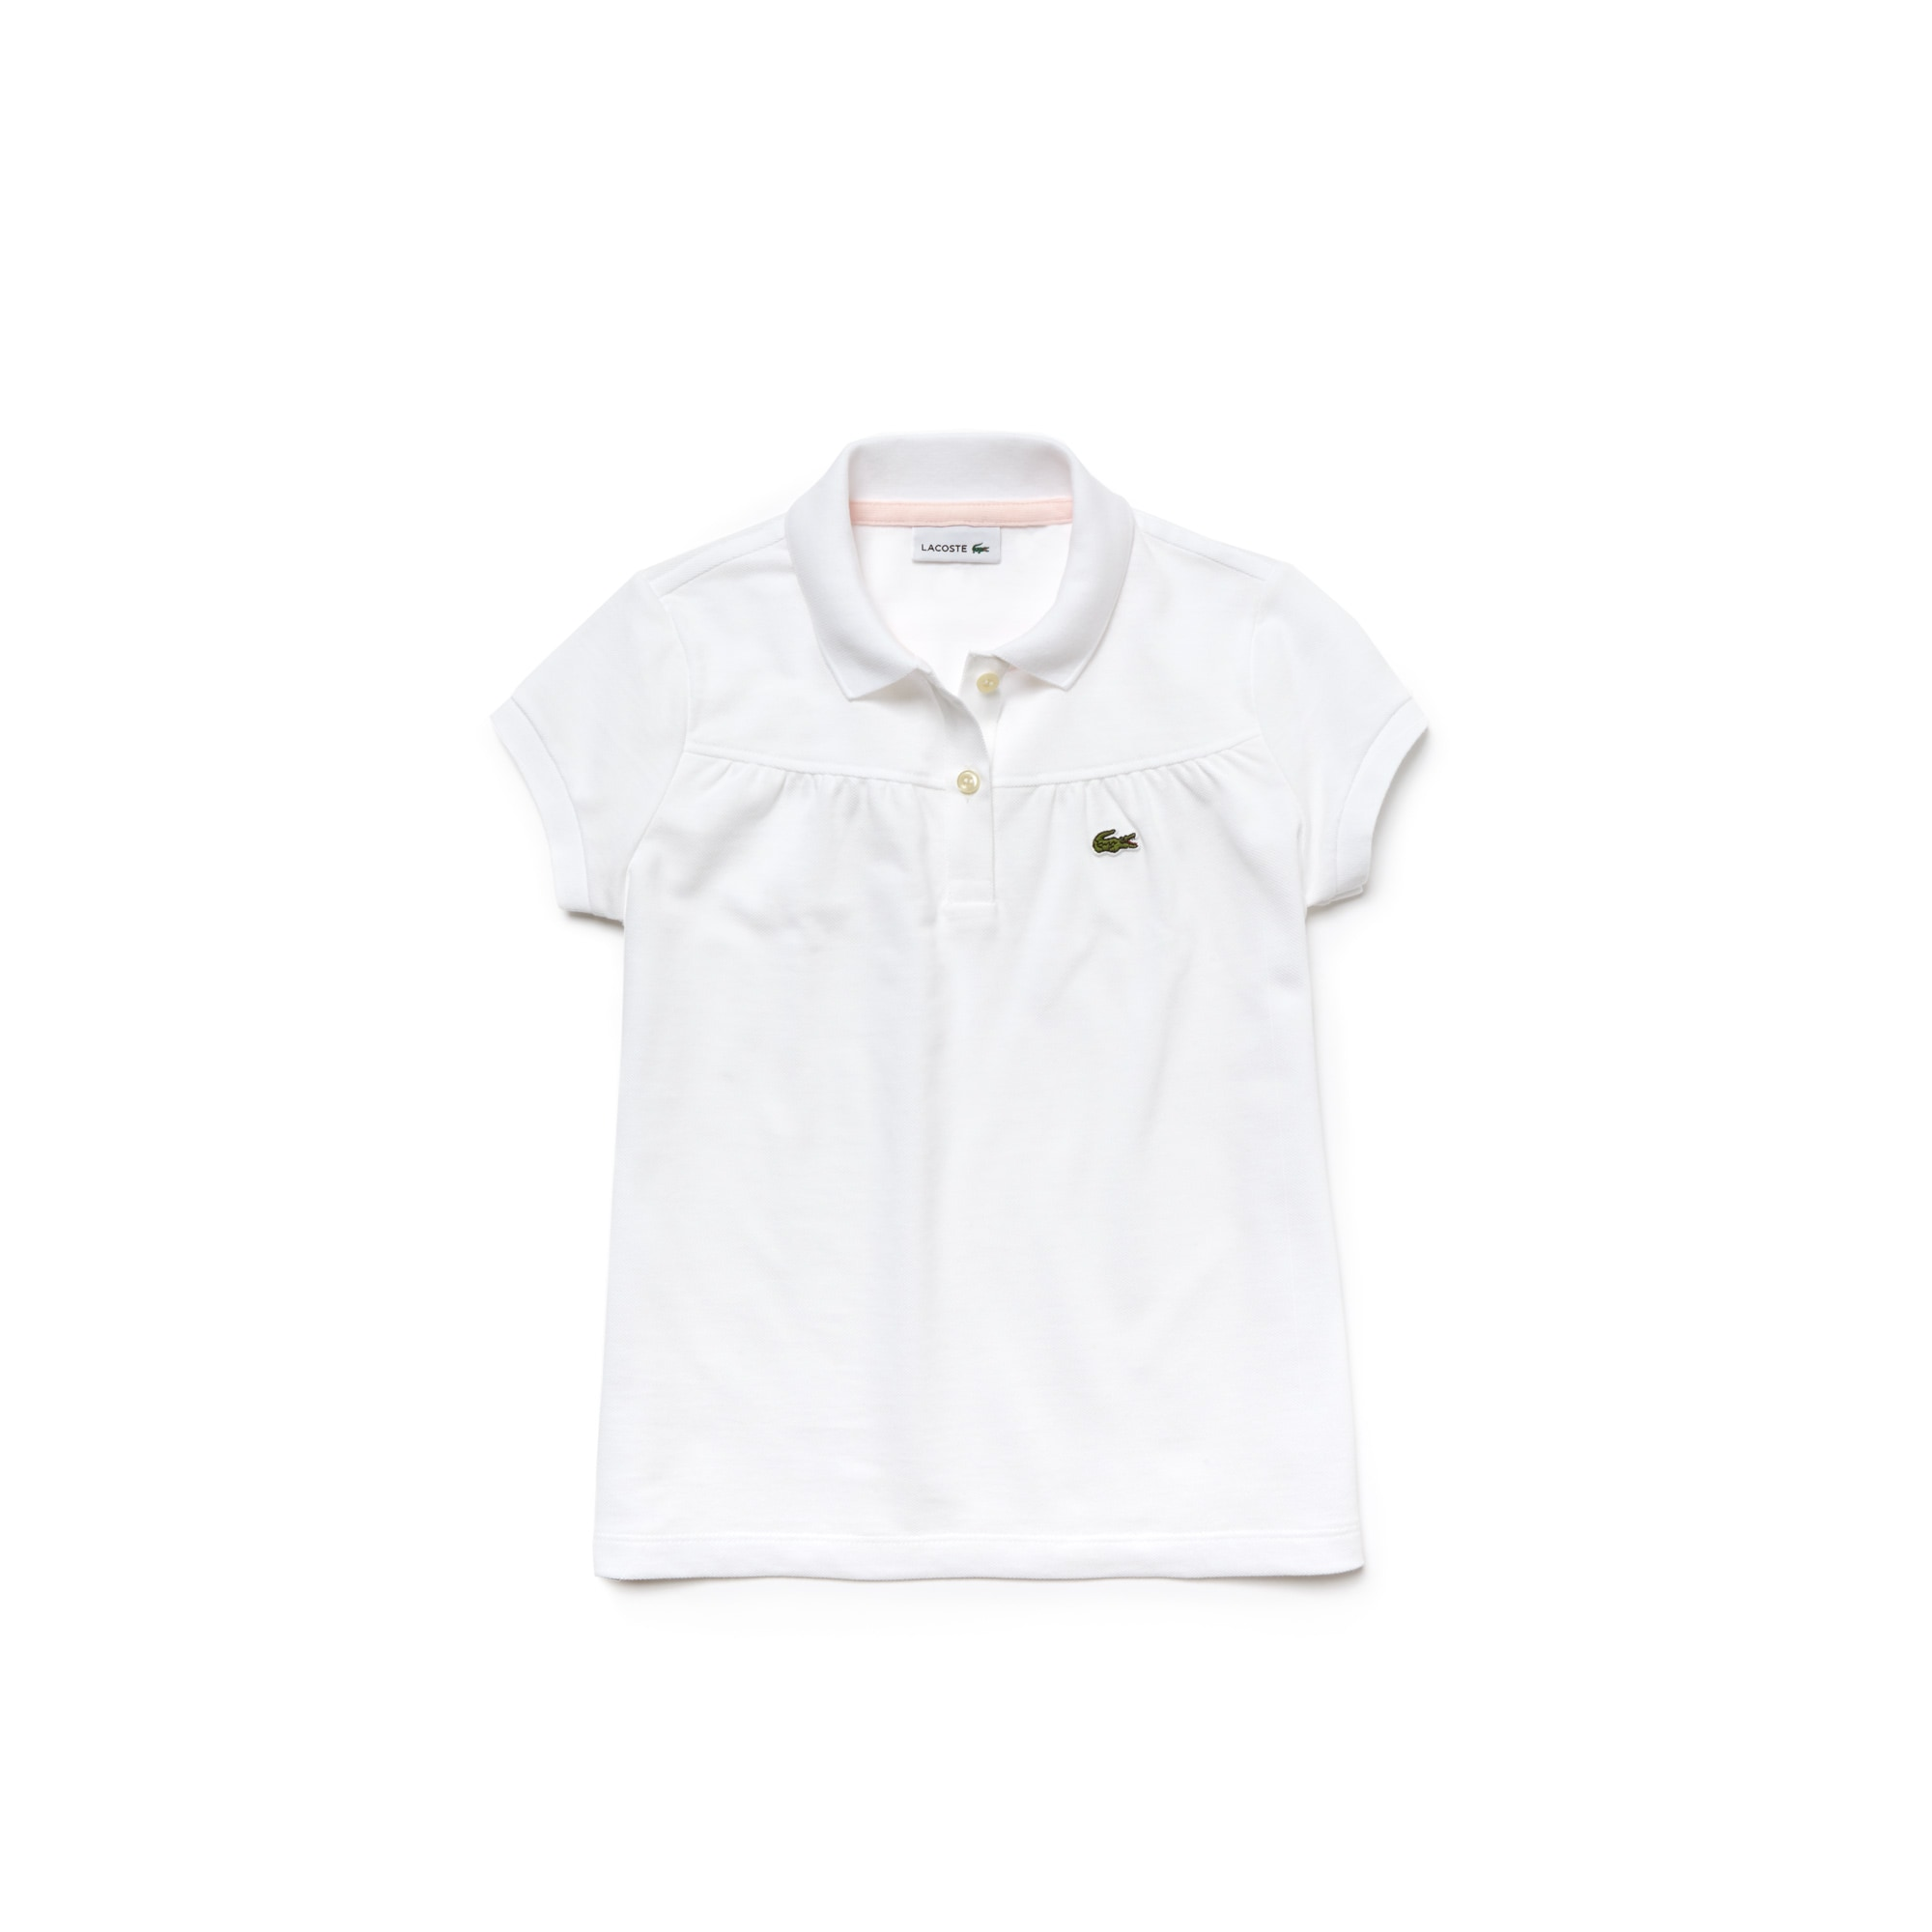 579def63e7185 Kids Lacoste Polo Shirt in gathered mini piqué